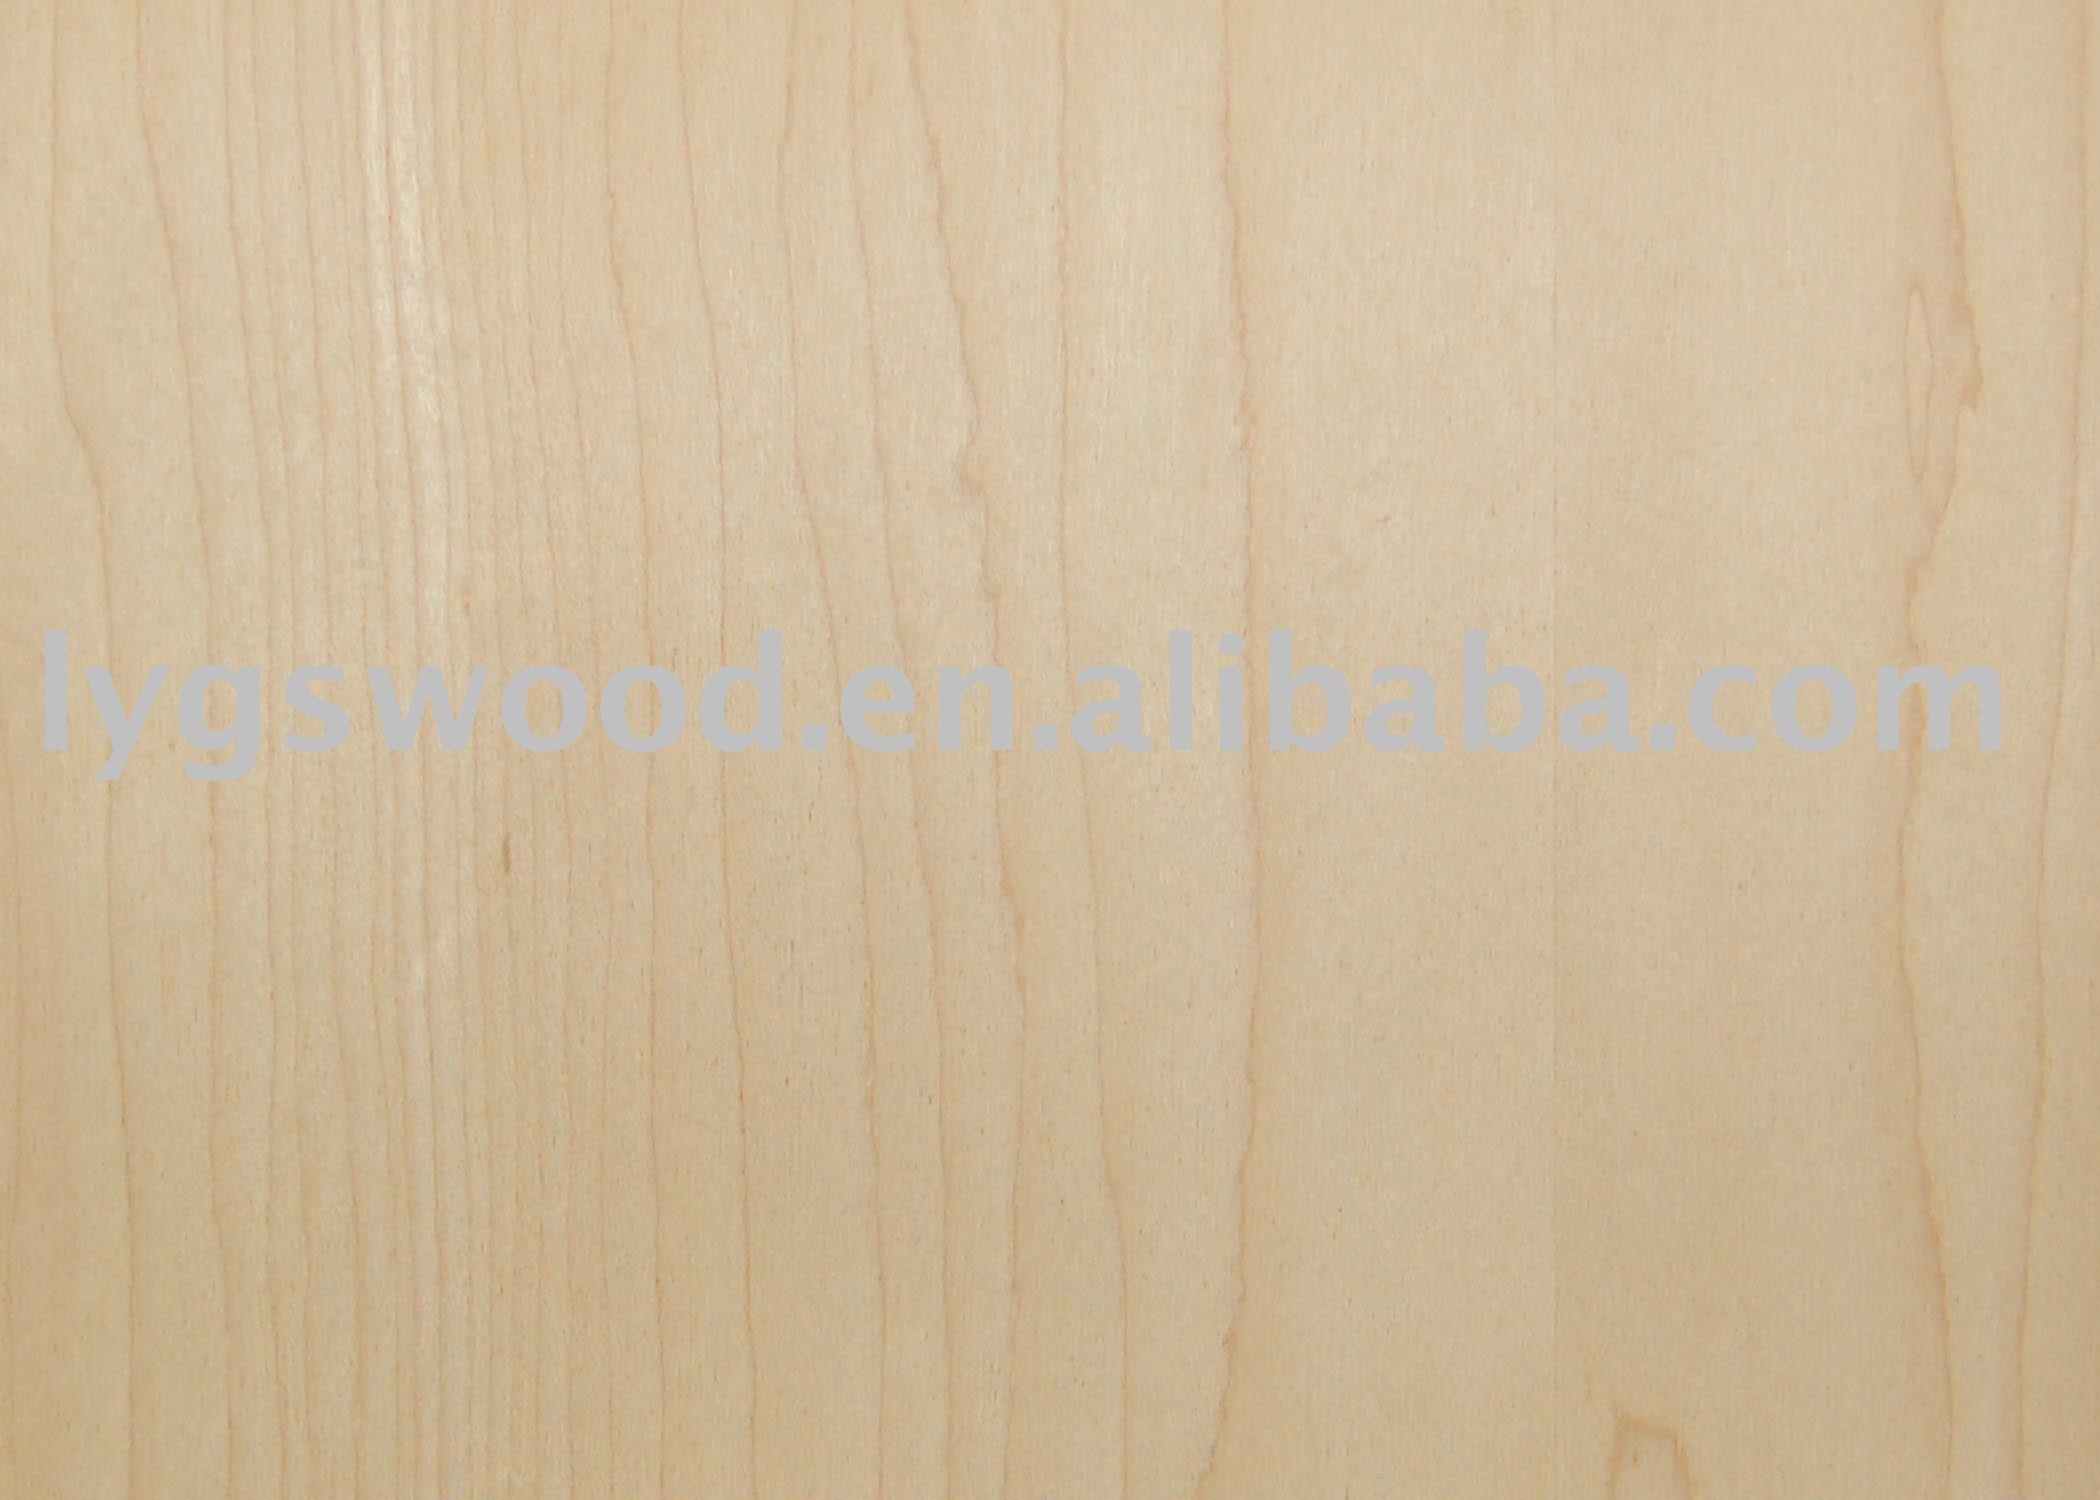 china birch plywood